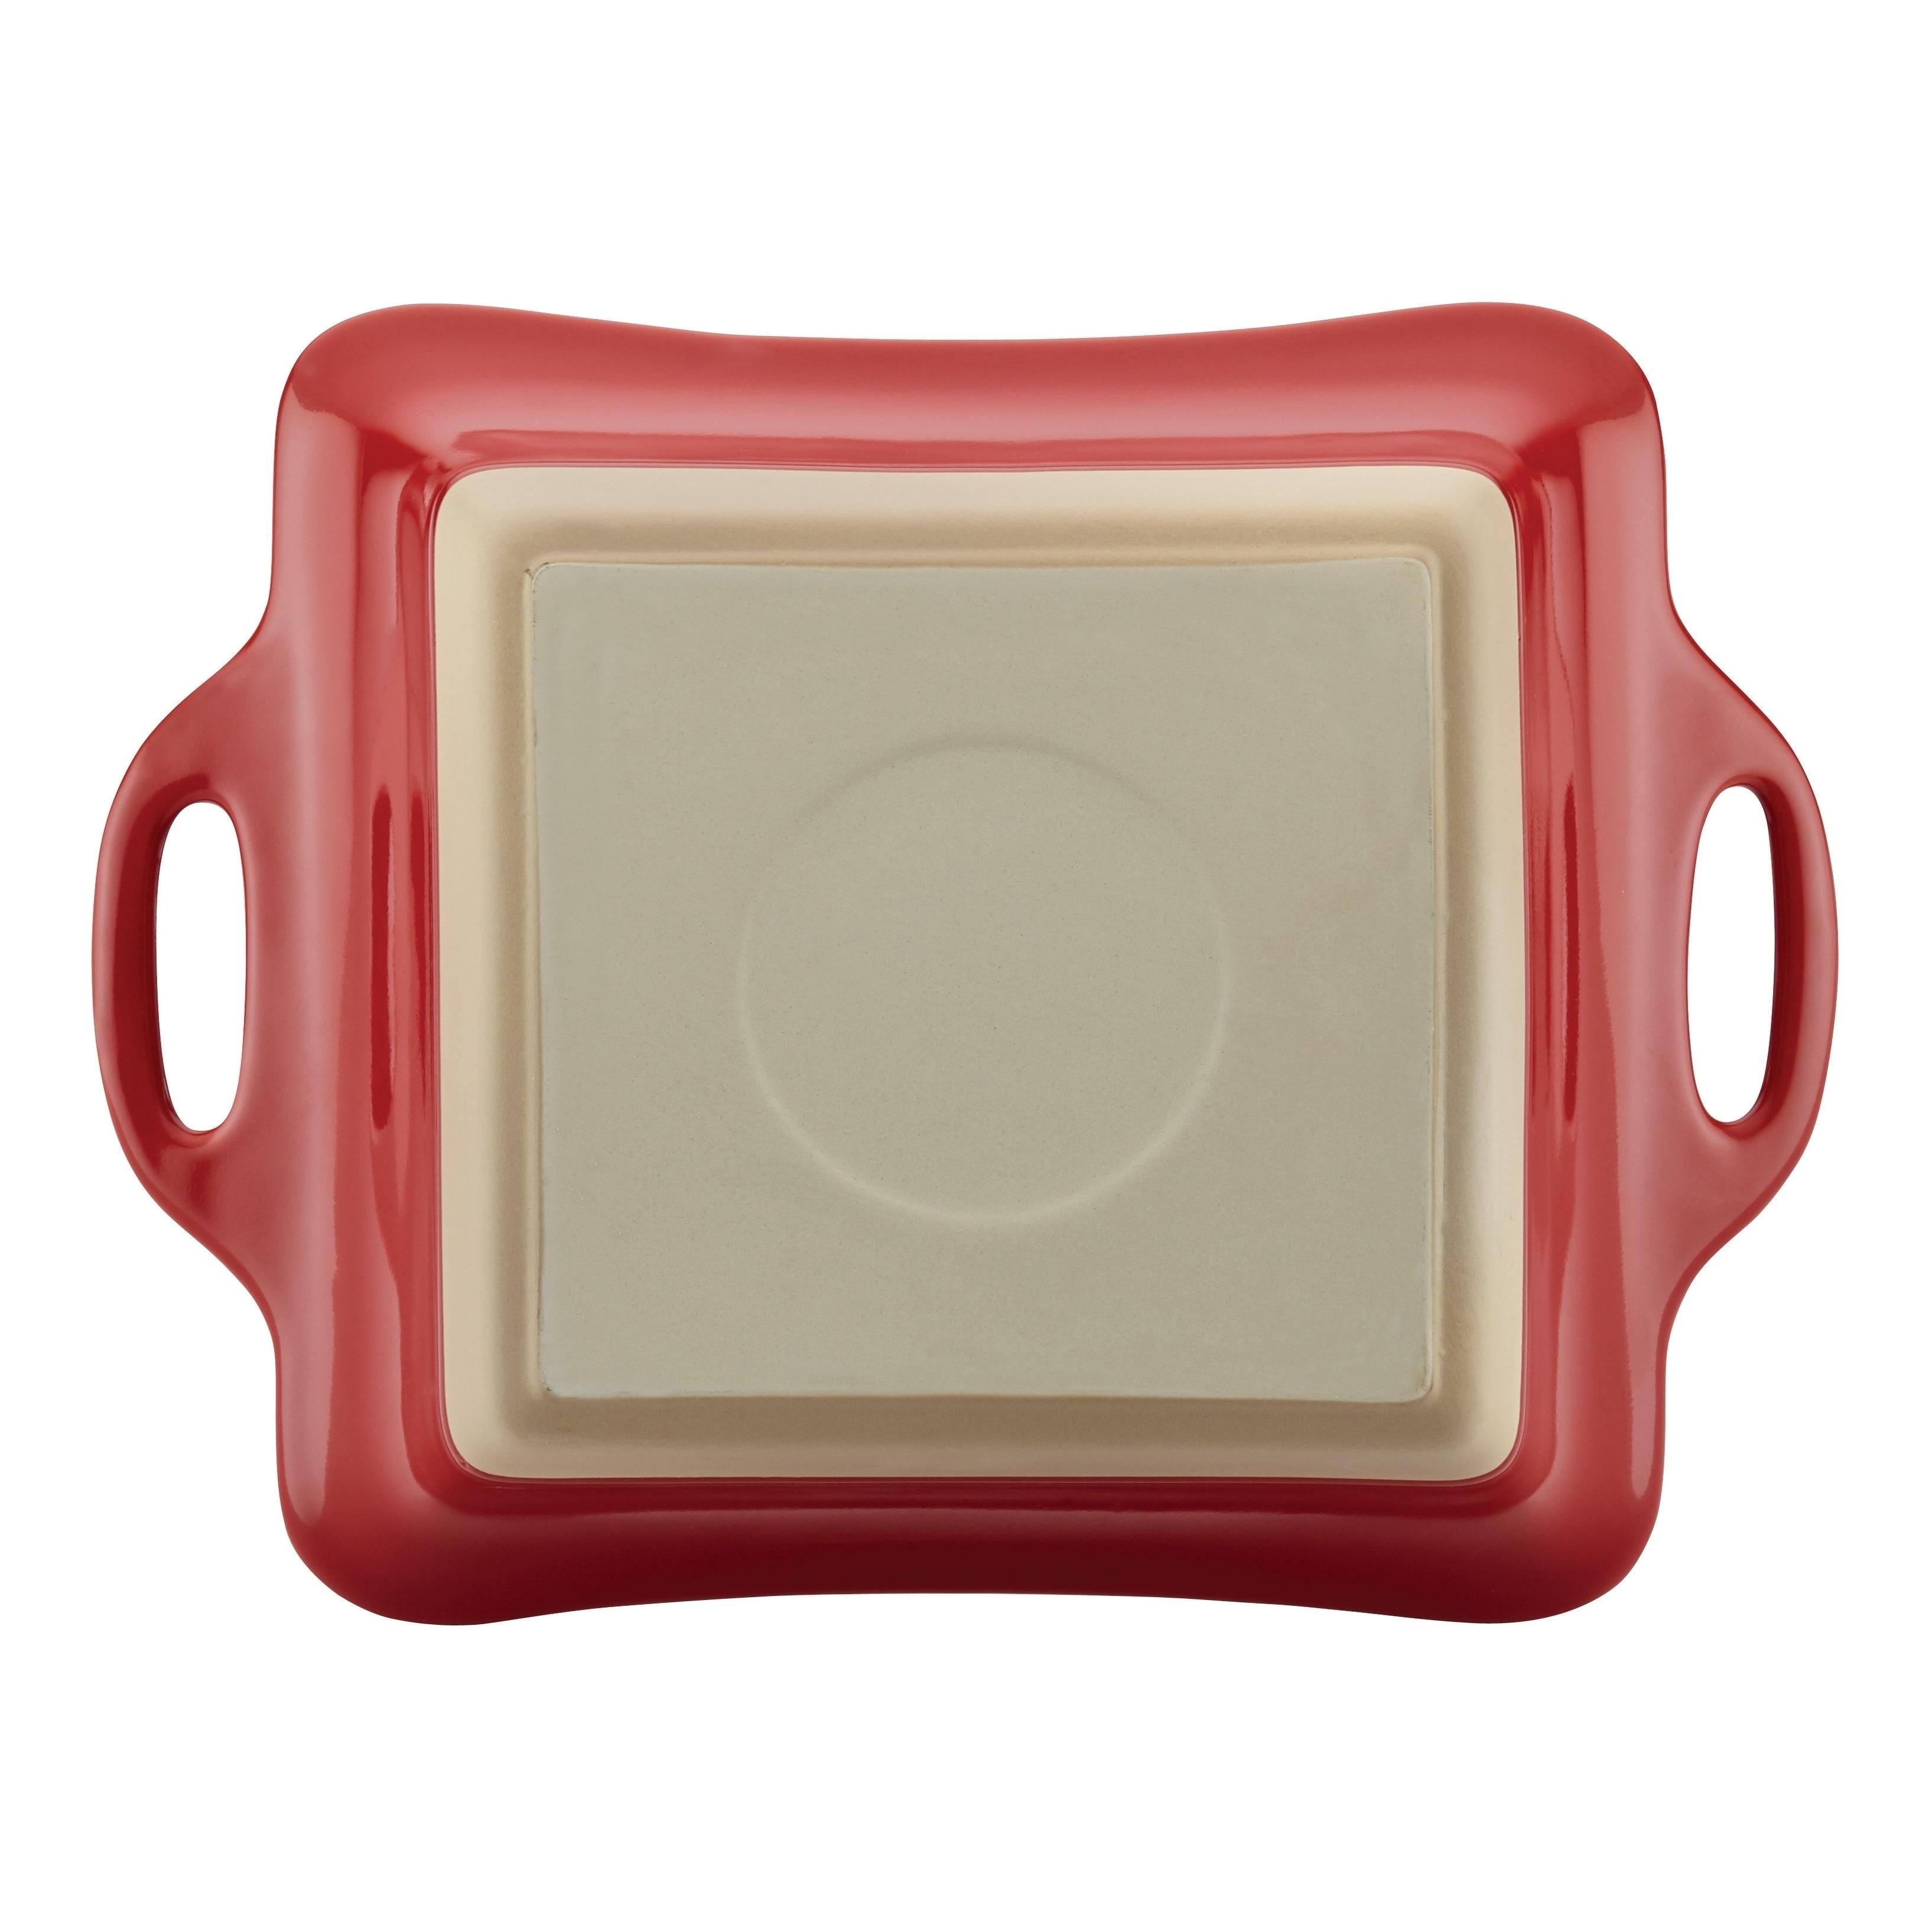 Rachael Ray Ceramics 2.5-Quart Casserole Pan with Lid Cherry